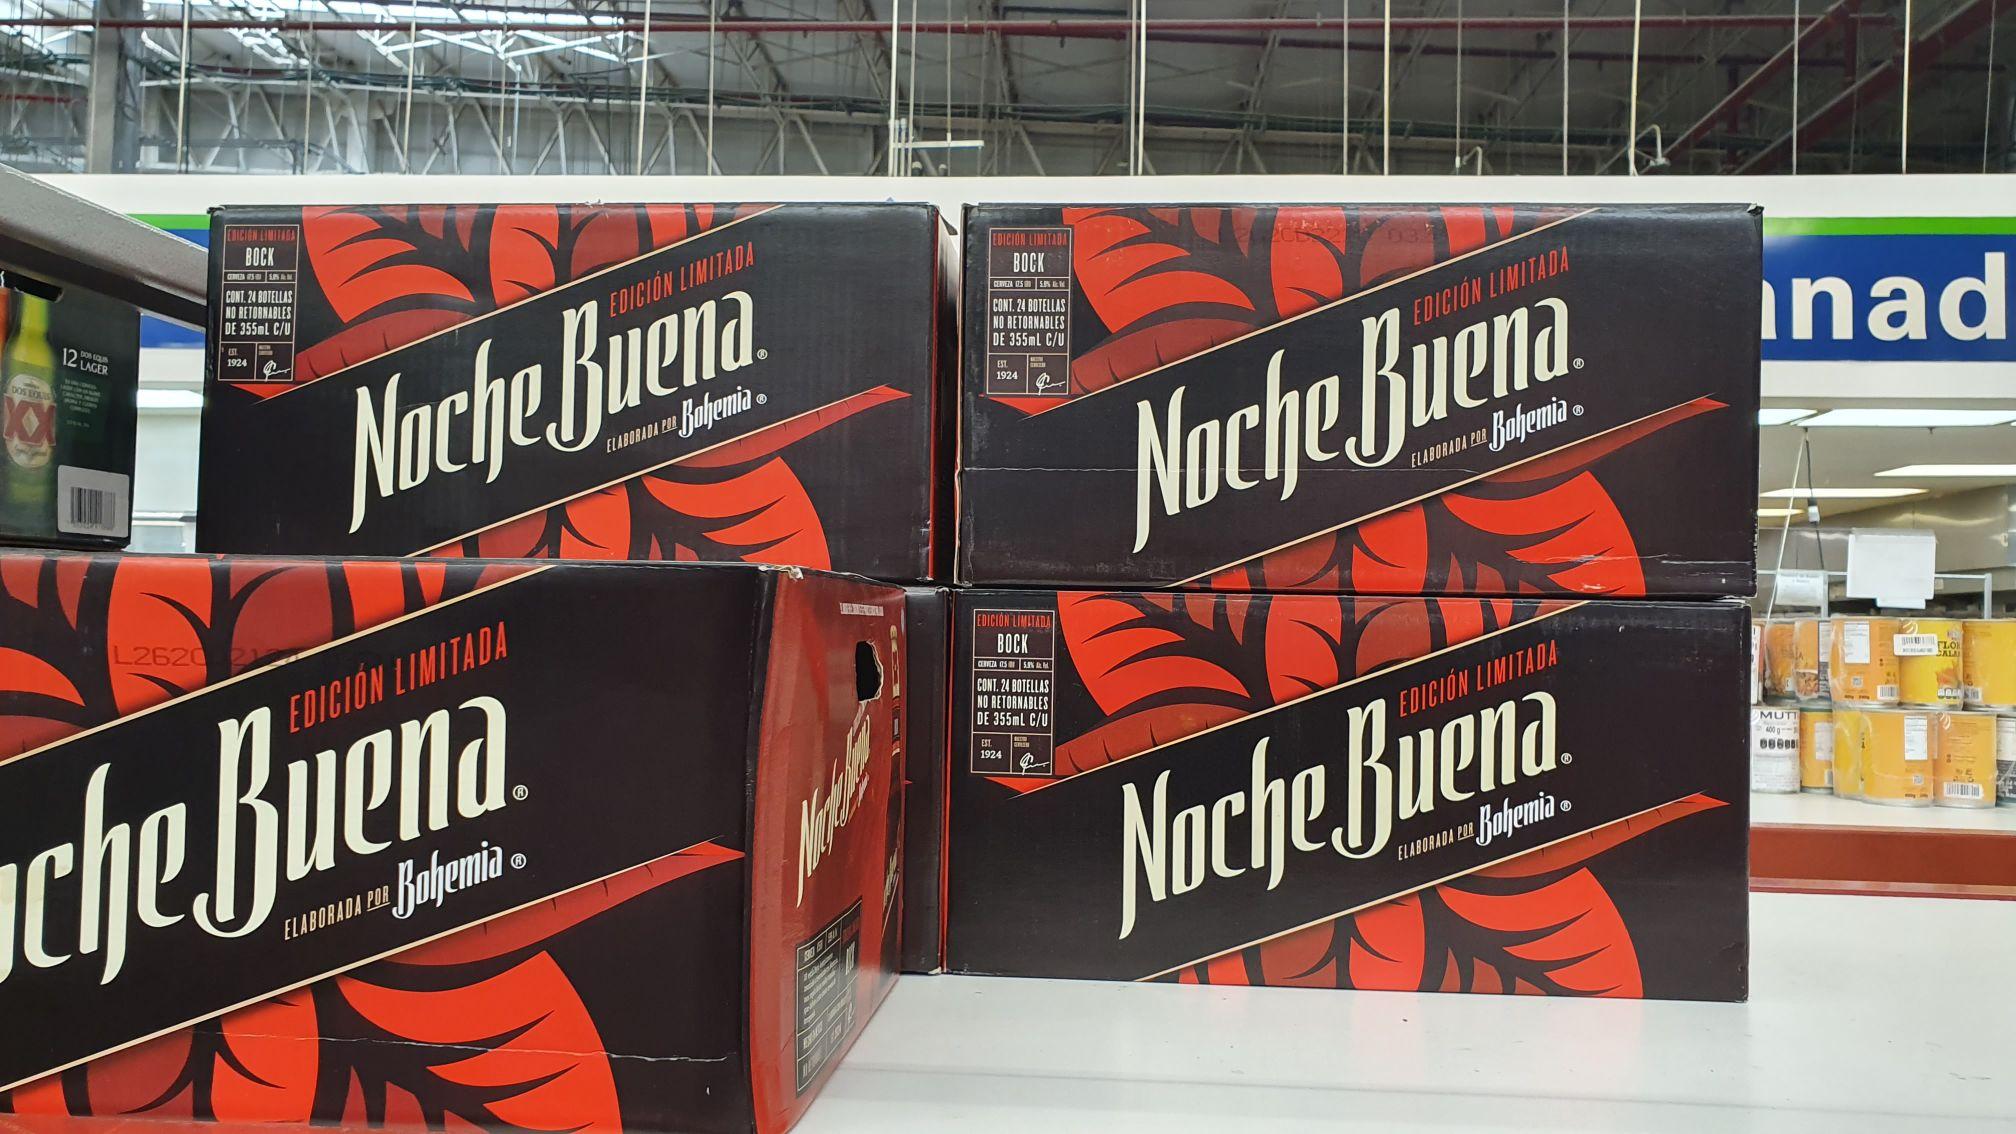 Sam's Club Ecatepec 30 30: 24 pack cerveza Noche Buena